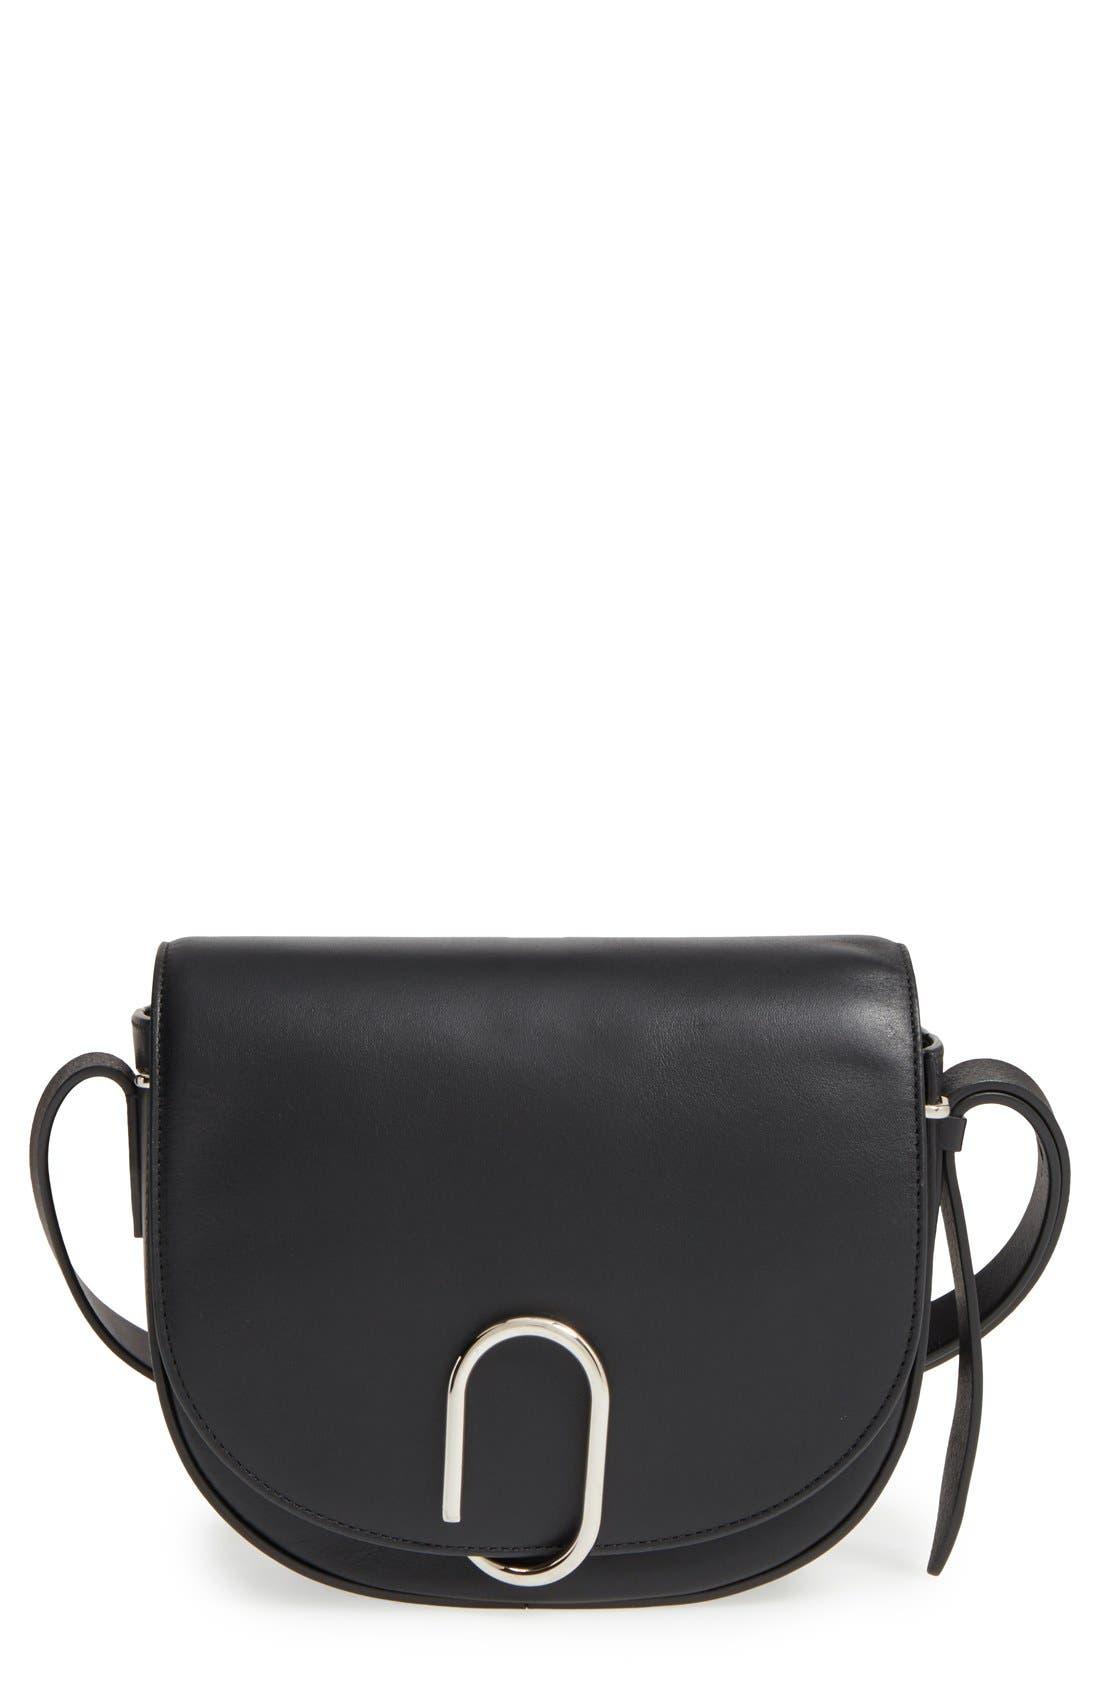 Alternate Image 1 Selected - 3.1 Phillip Lim Alix Leather Saddle Bag